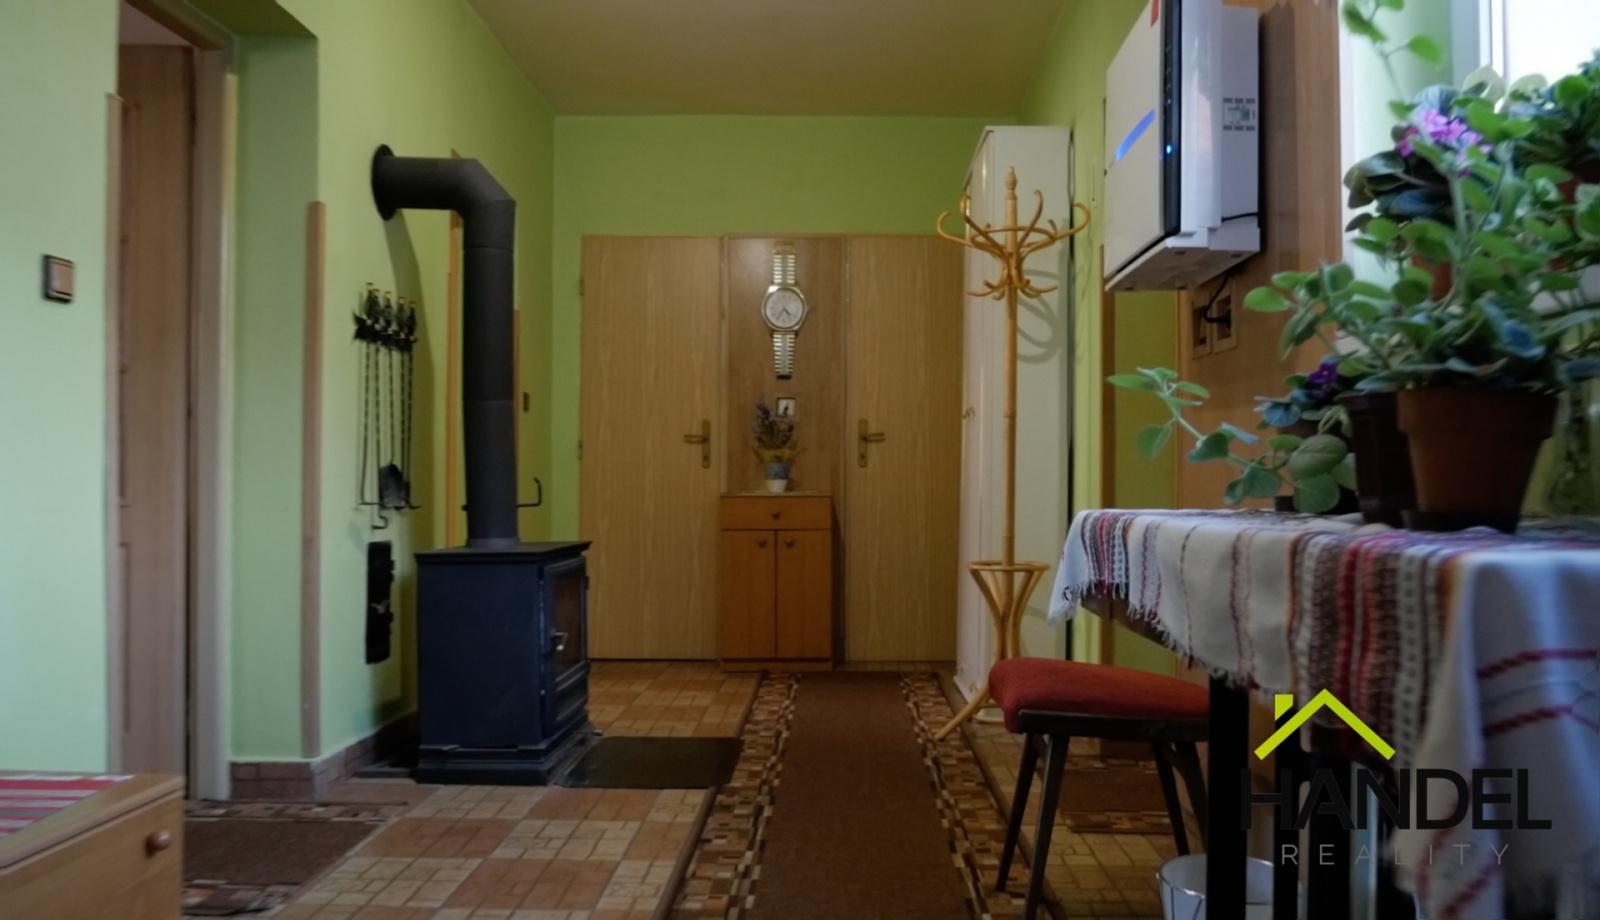 Kostice, ,Rodinný dům,Na prodej,1039